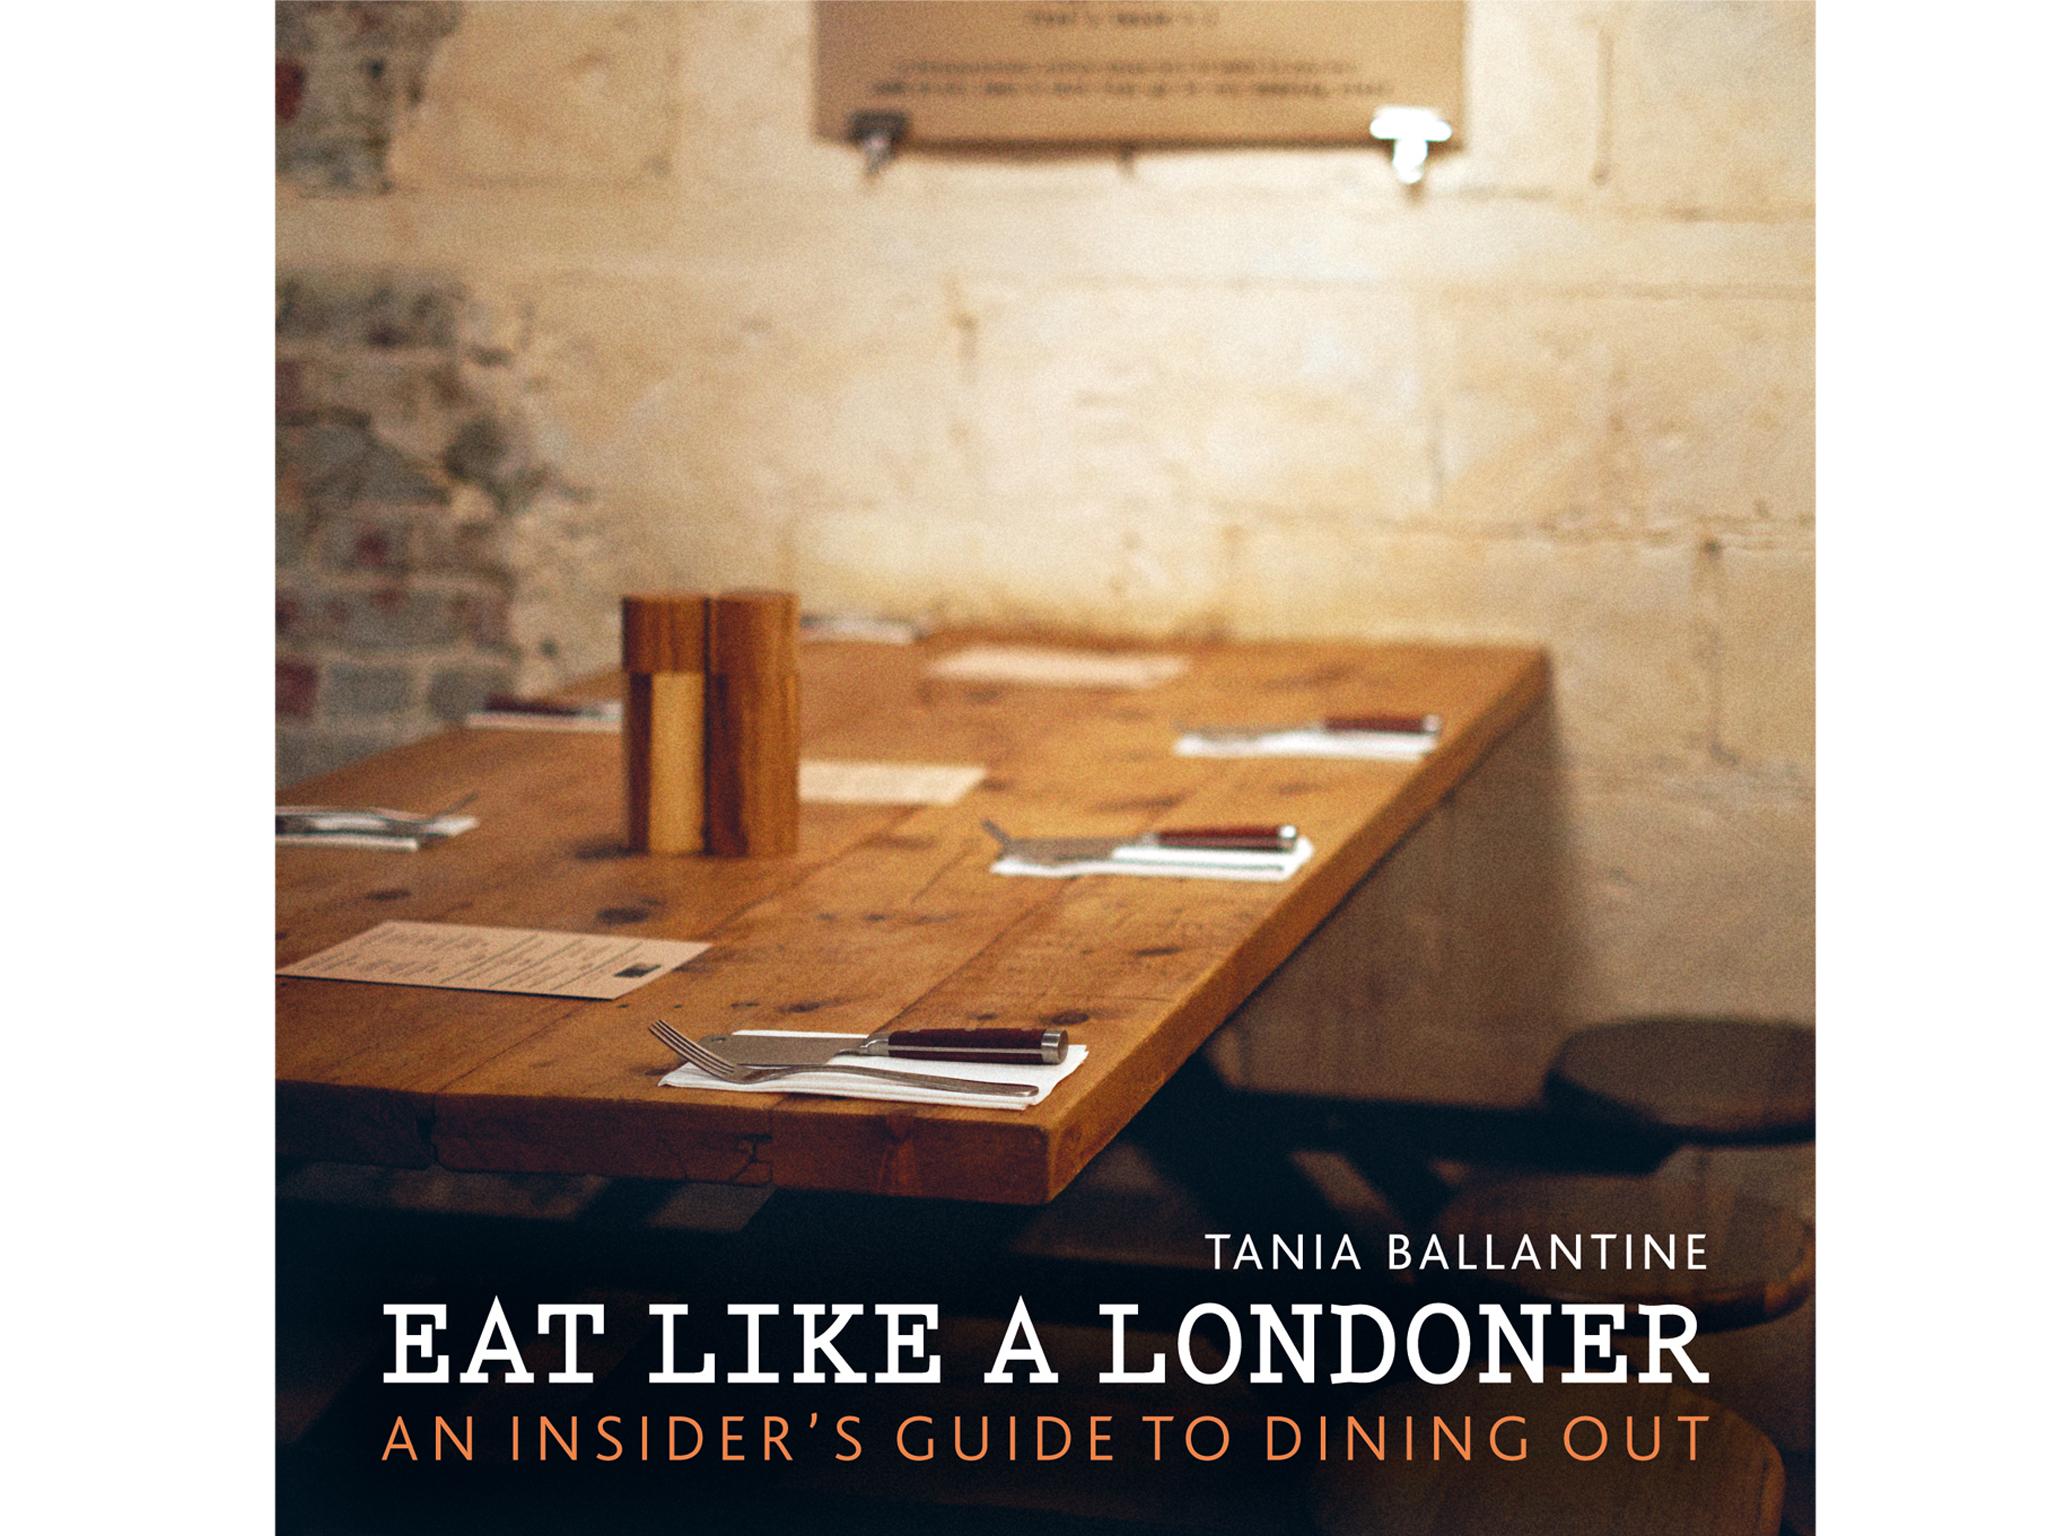 Tania Ballantine - Eat Like a Londoner